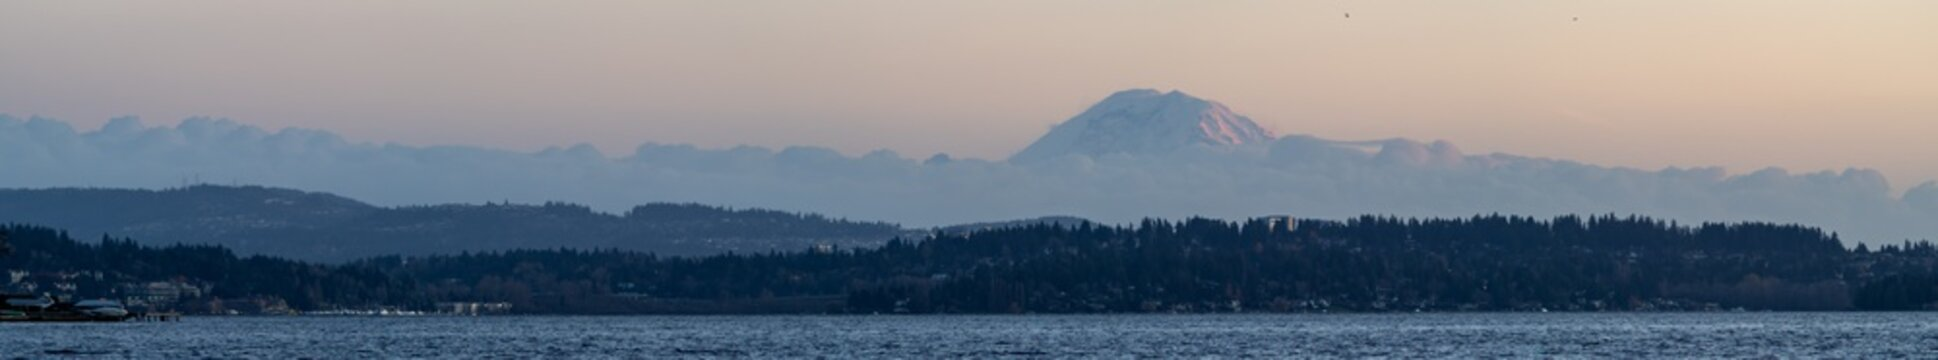 Panorama Featuring Mount Rainier and Lake Washington.